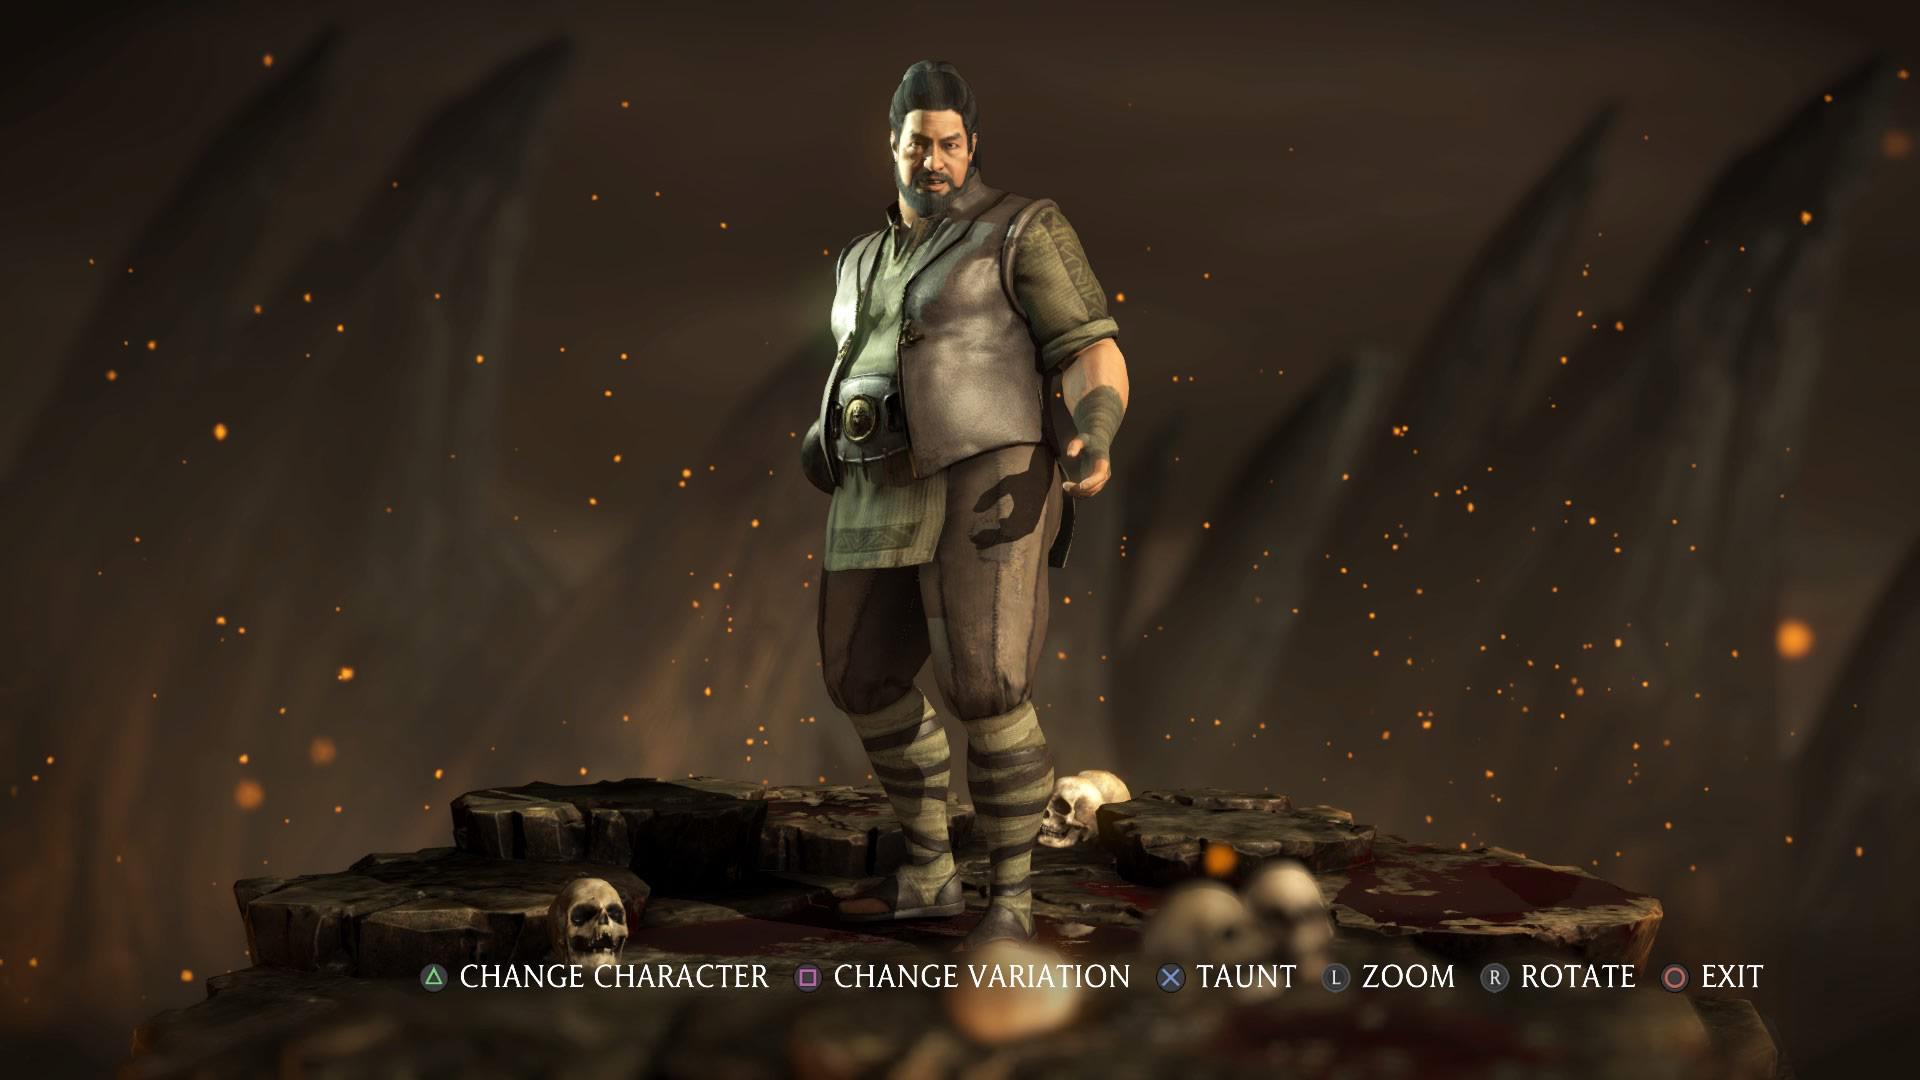 Mortal Kombat XL Kombat Pack 2  3 out of 14 image gallery